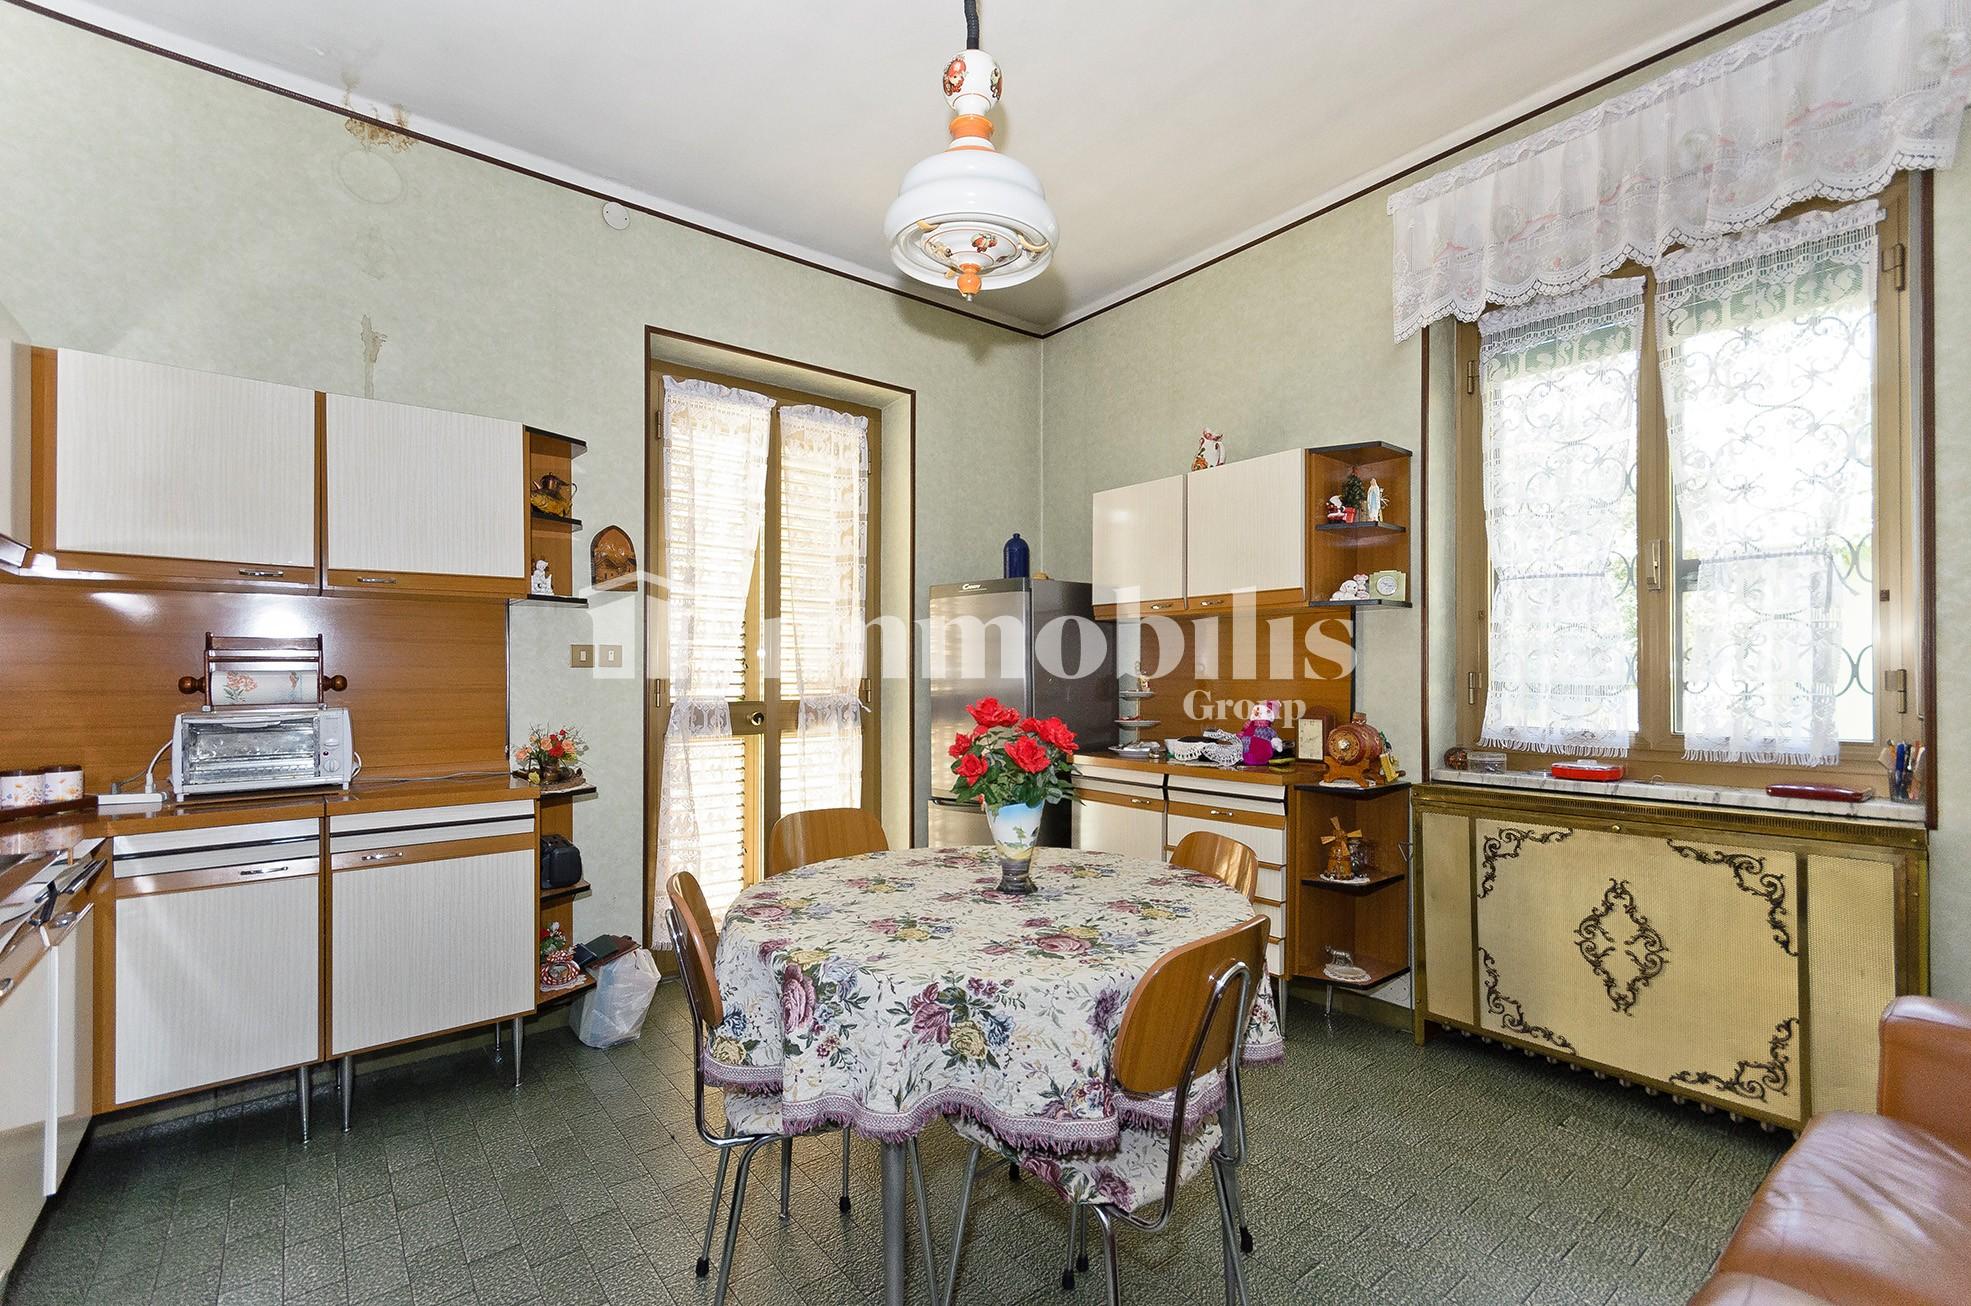 Villetta indipendente - Immobilis